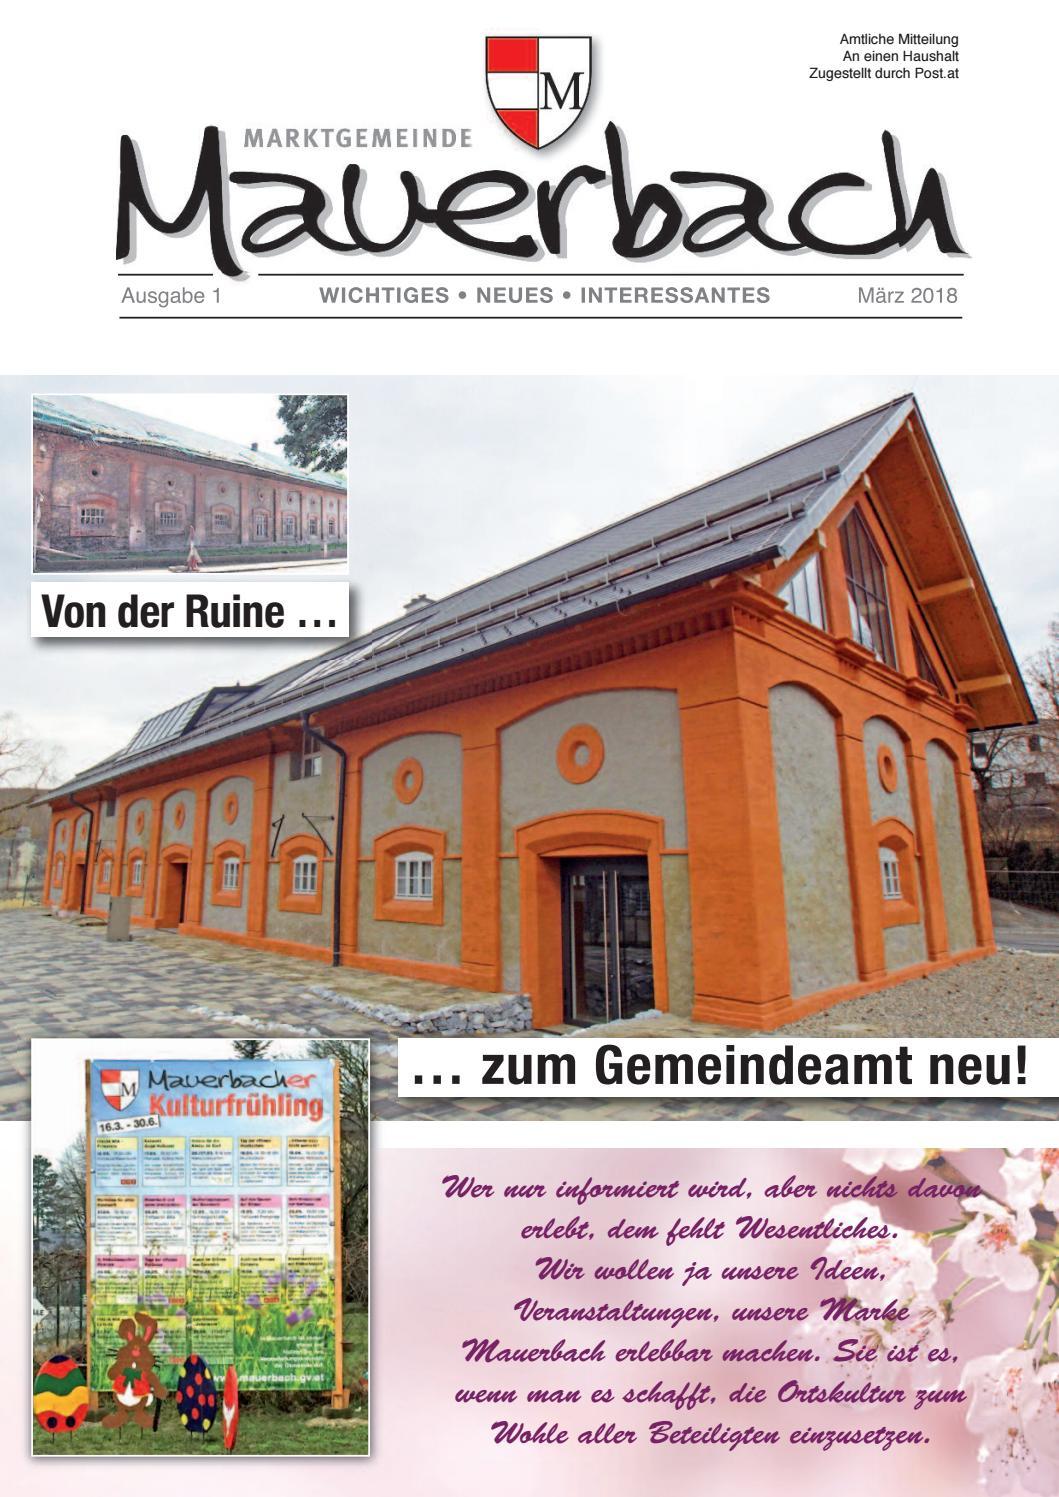 Blitz dating aus mauerbach - Sittersdorf dating events